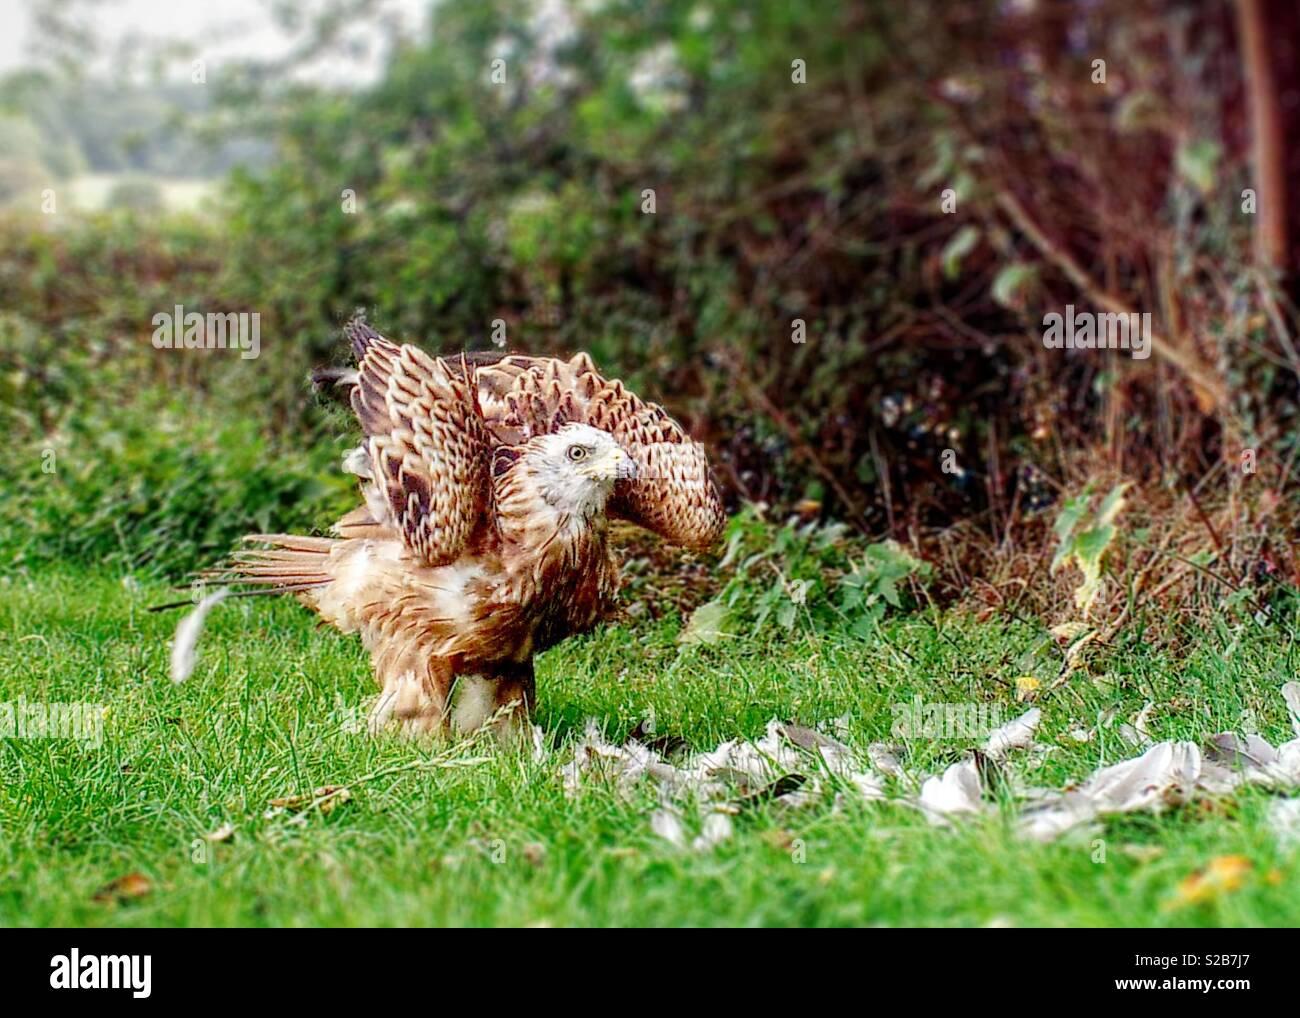 Red Kite (milvus Milvus) landing on grass. - Stock Image